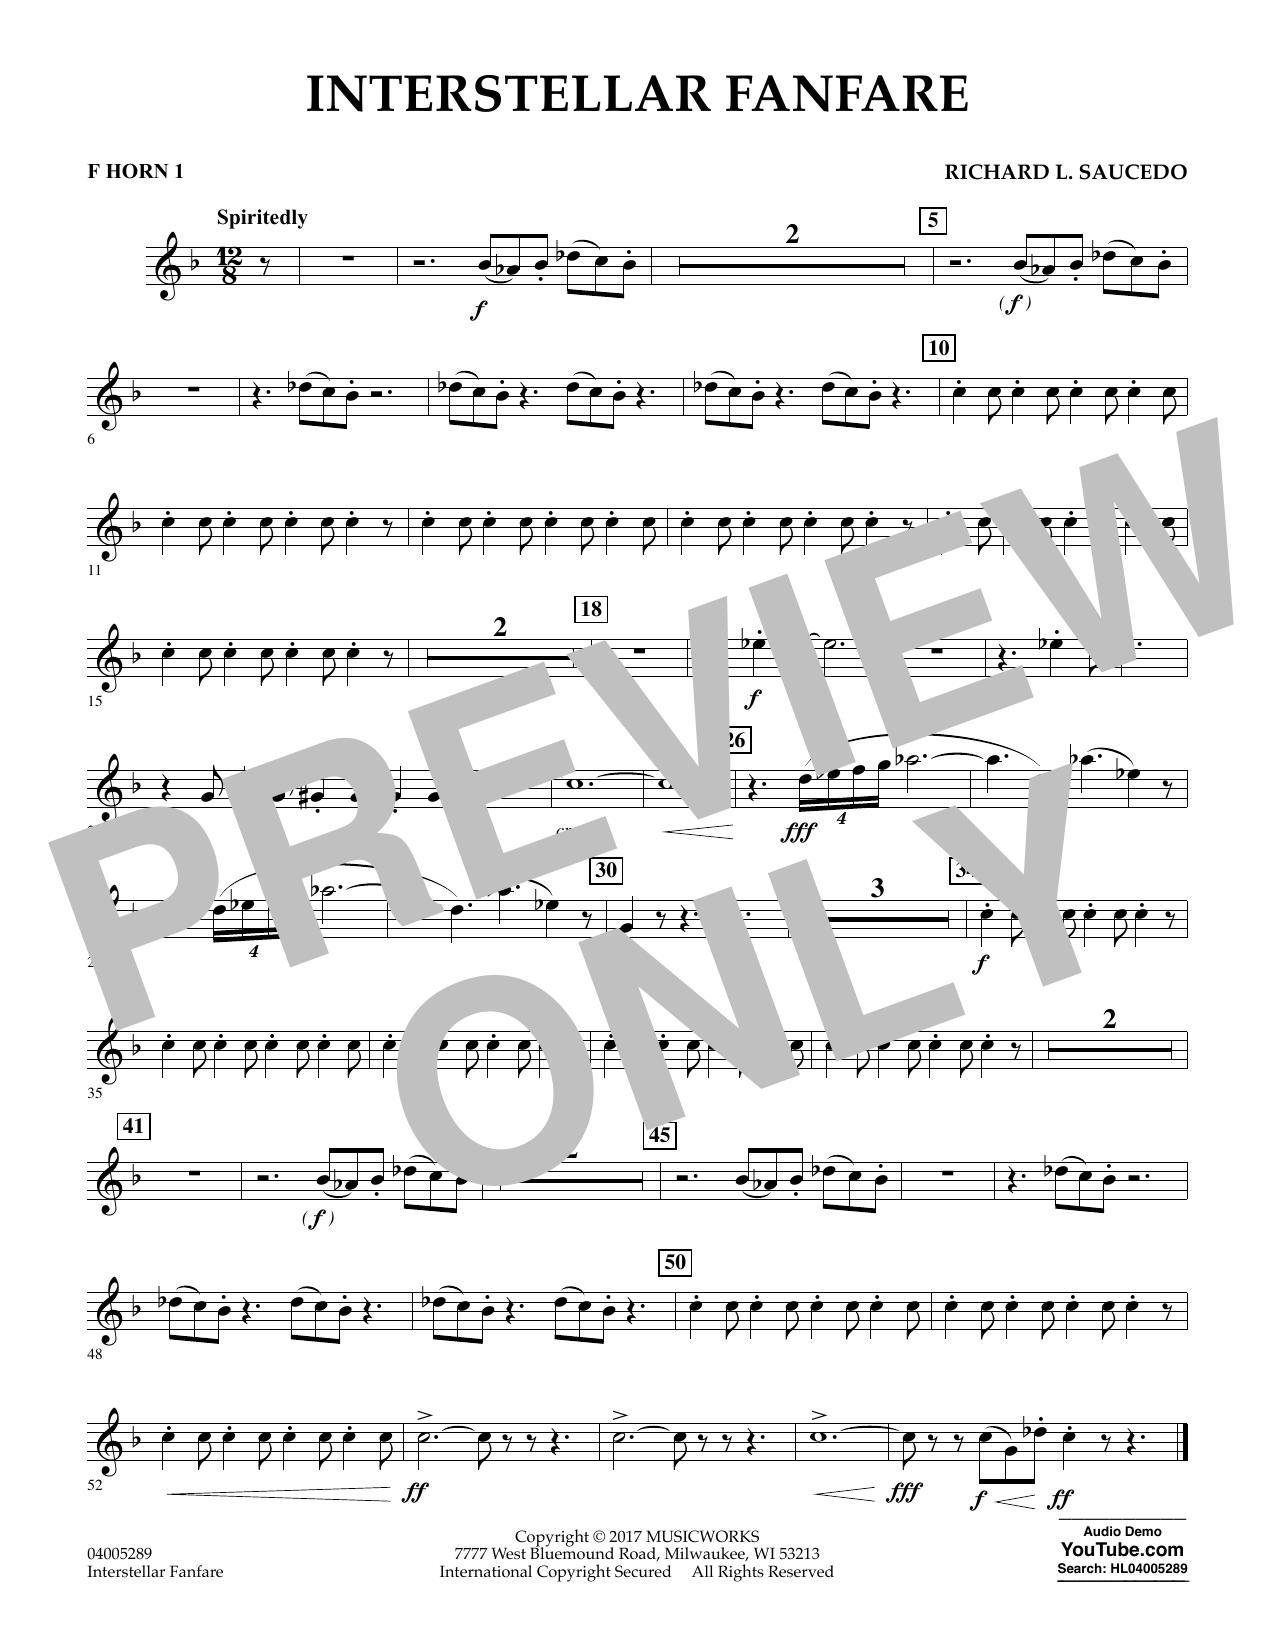 Interstellar Fanfare - F Horn 1 (Concert Band)